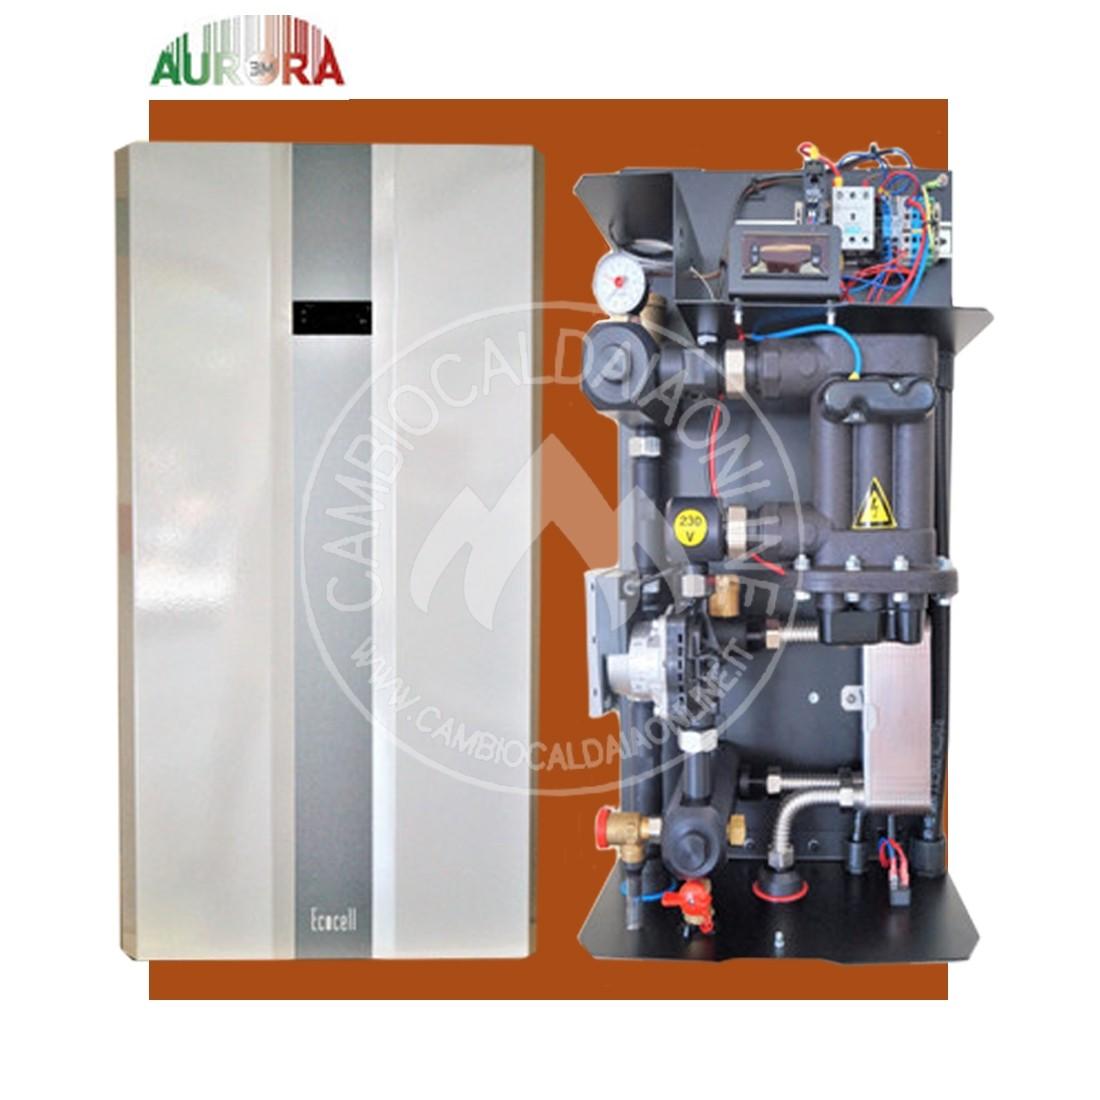 Cambiocaldaiaonline.it AURORA 3M AURORA 3M ECOCELL Caldaia Ionica monofase 3/6 kWp (4.5/9.0kW termici) trifase 9/25kWp (13.50/37.50kW termici) solo riscaldamento Cod: Aurora base-340